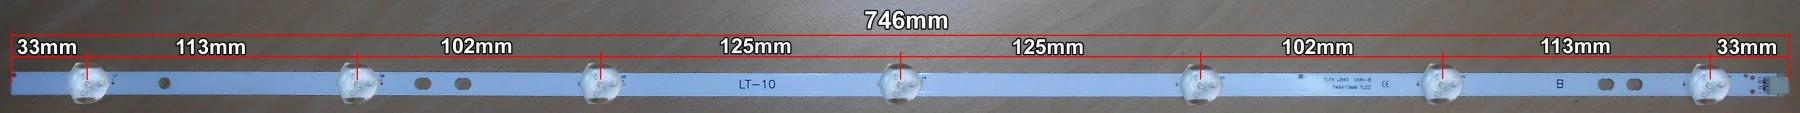 Диодна лента 1бр. LED Backlight 17DLB40VXR1 LB40017 V0_03 B-TYPE